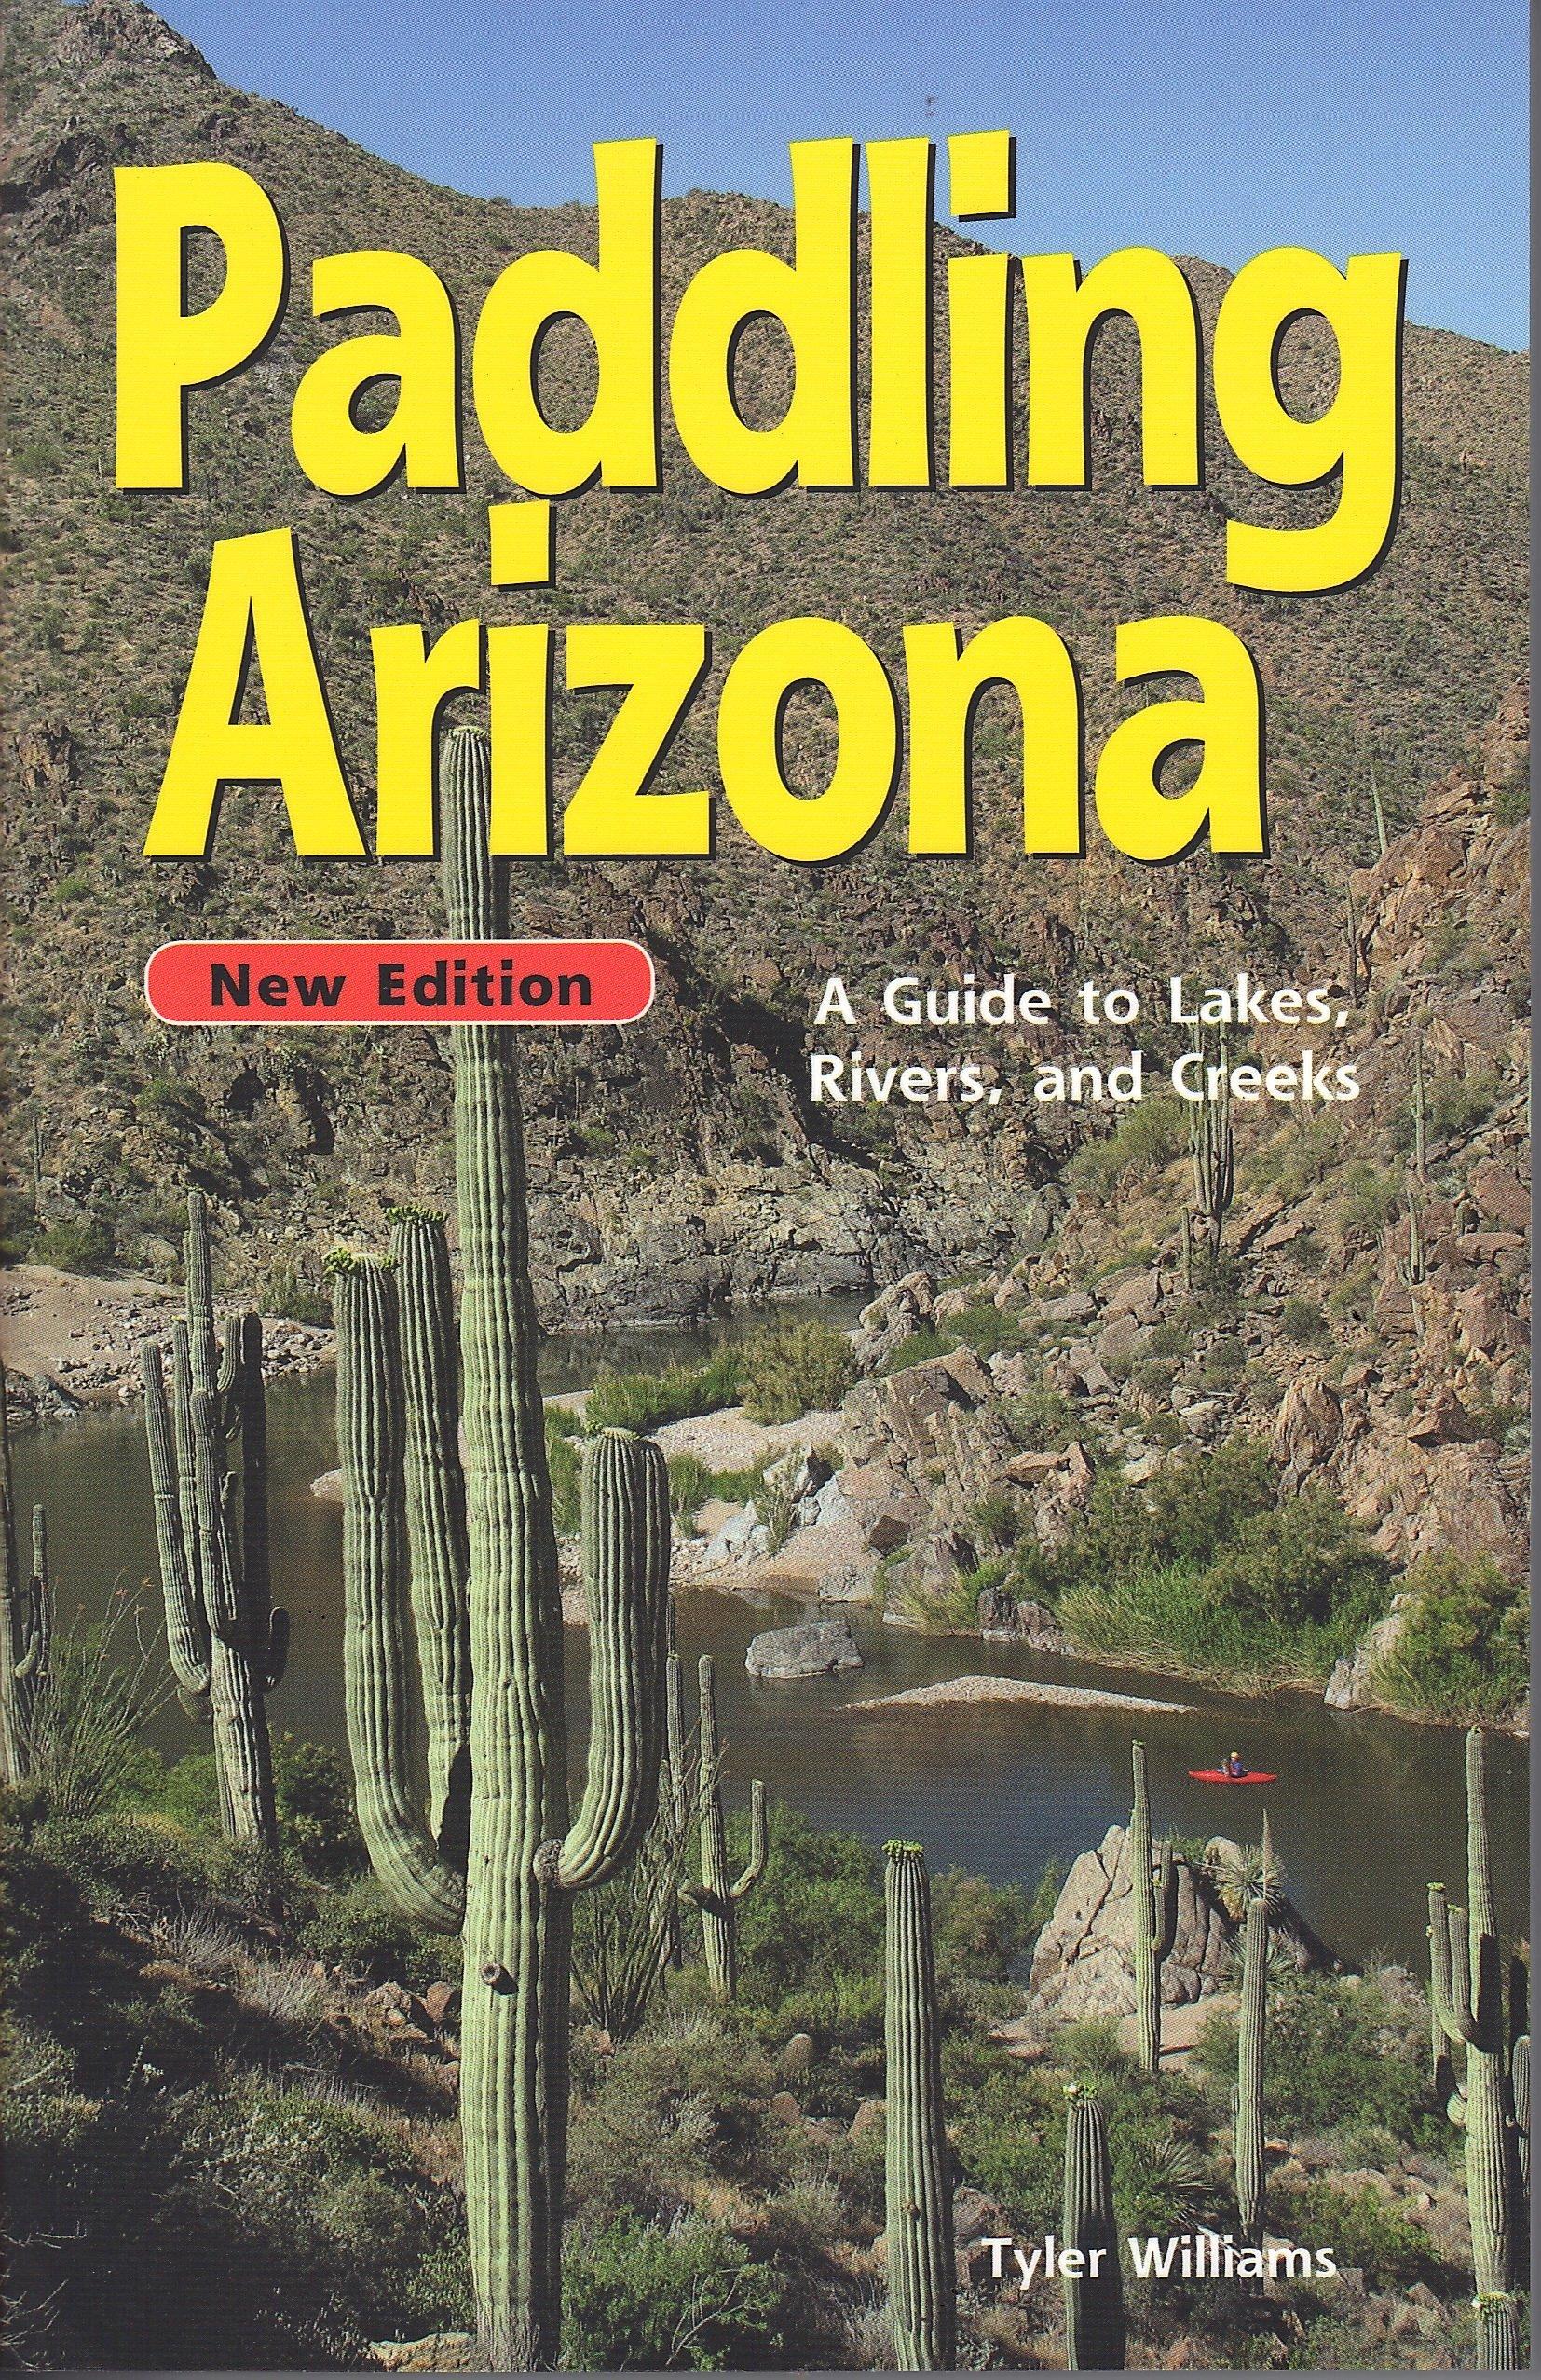 Paddling Arizona: A Guide to Lake, Rivers, and Creeks ebook